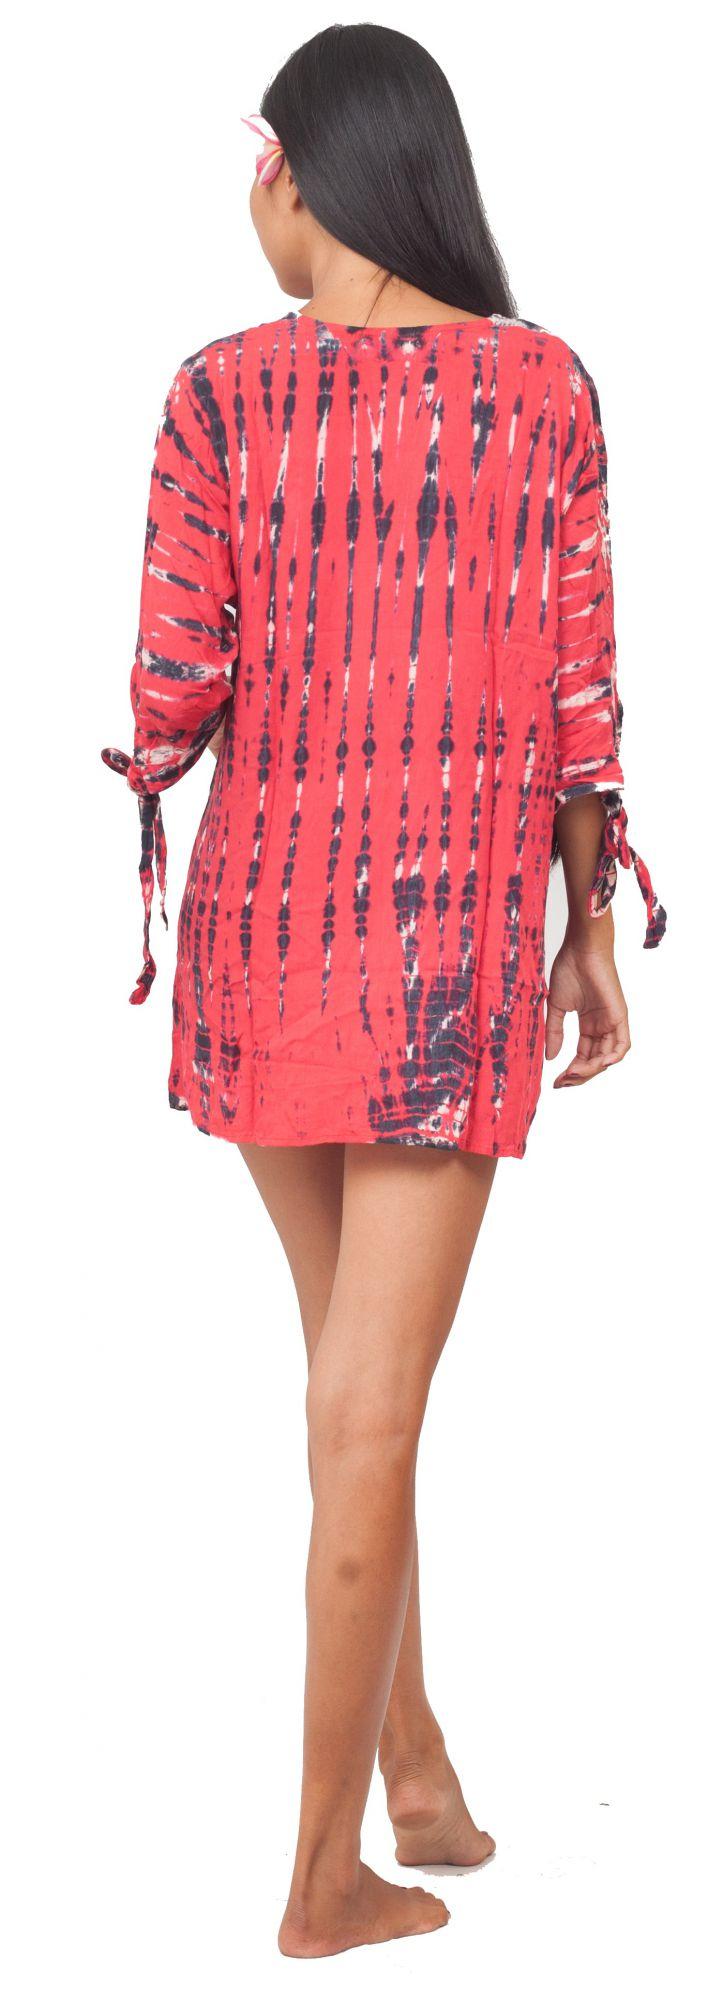 Robe de plage courte tie dye rose